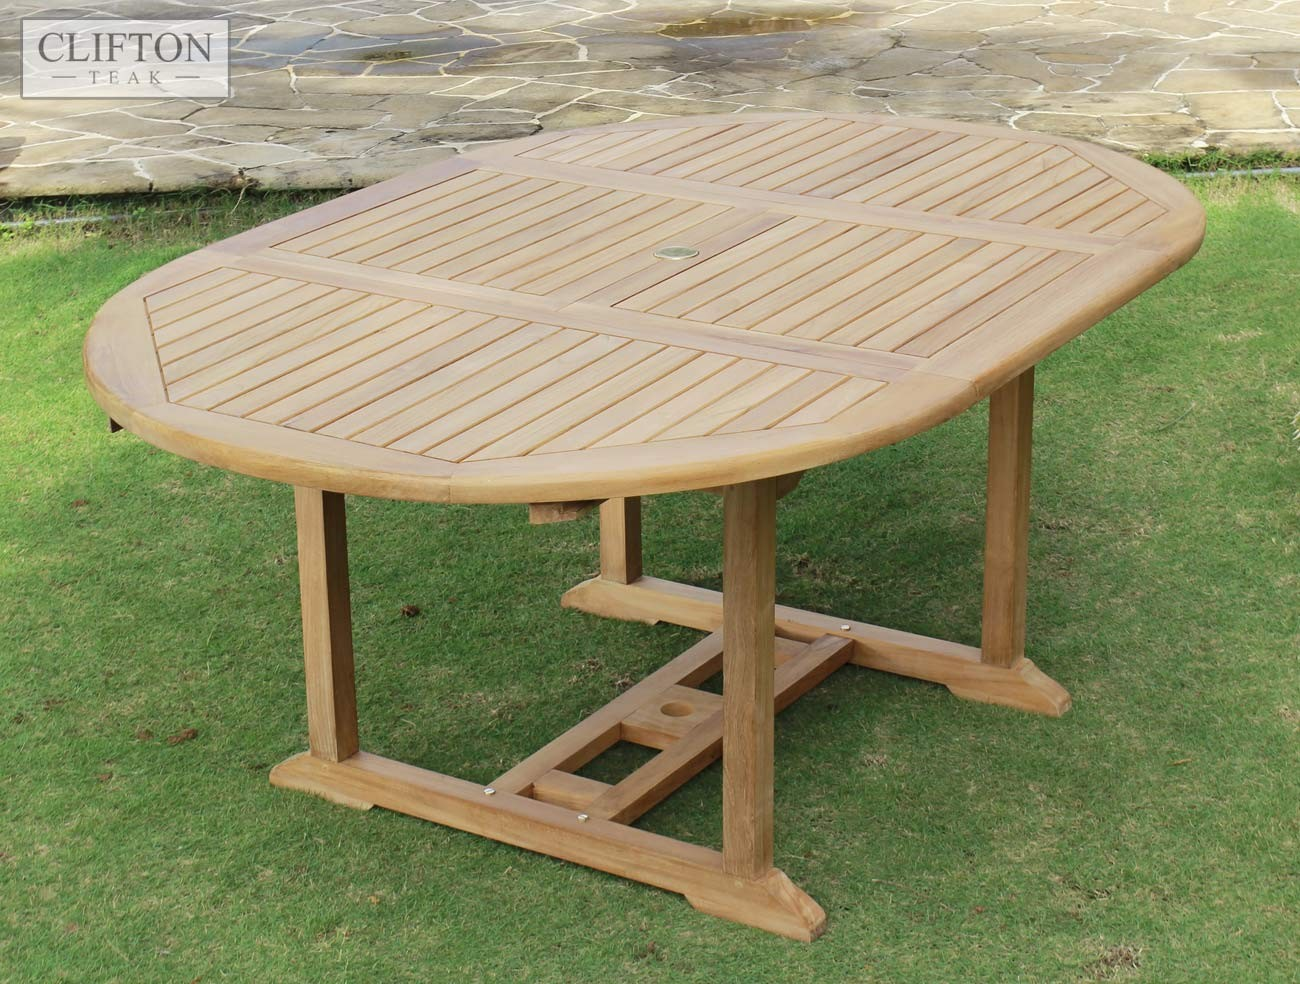 Devon Teak 1.2-1.7m Extending Table 1 & Teak Devon | 120 to 170cm Extending Table | Oval Garden Table | Casa ...